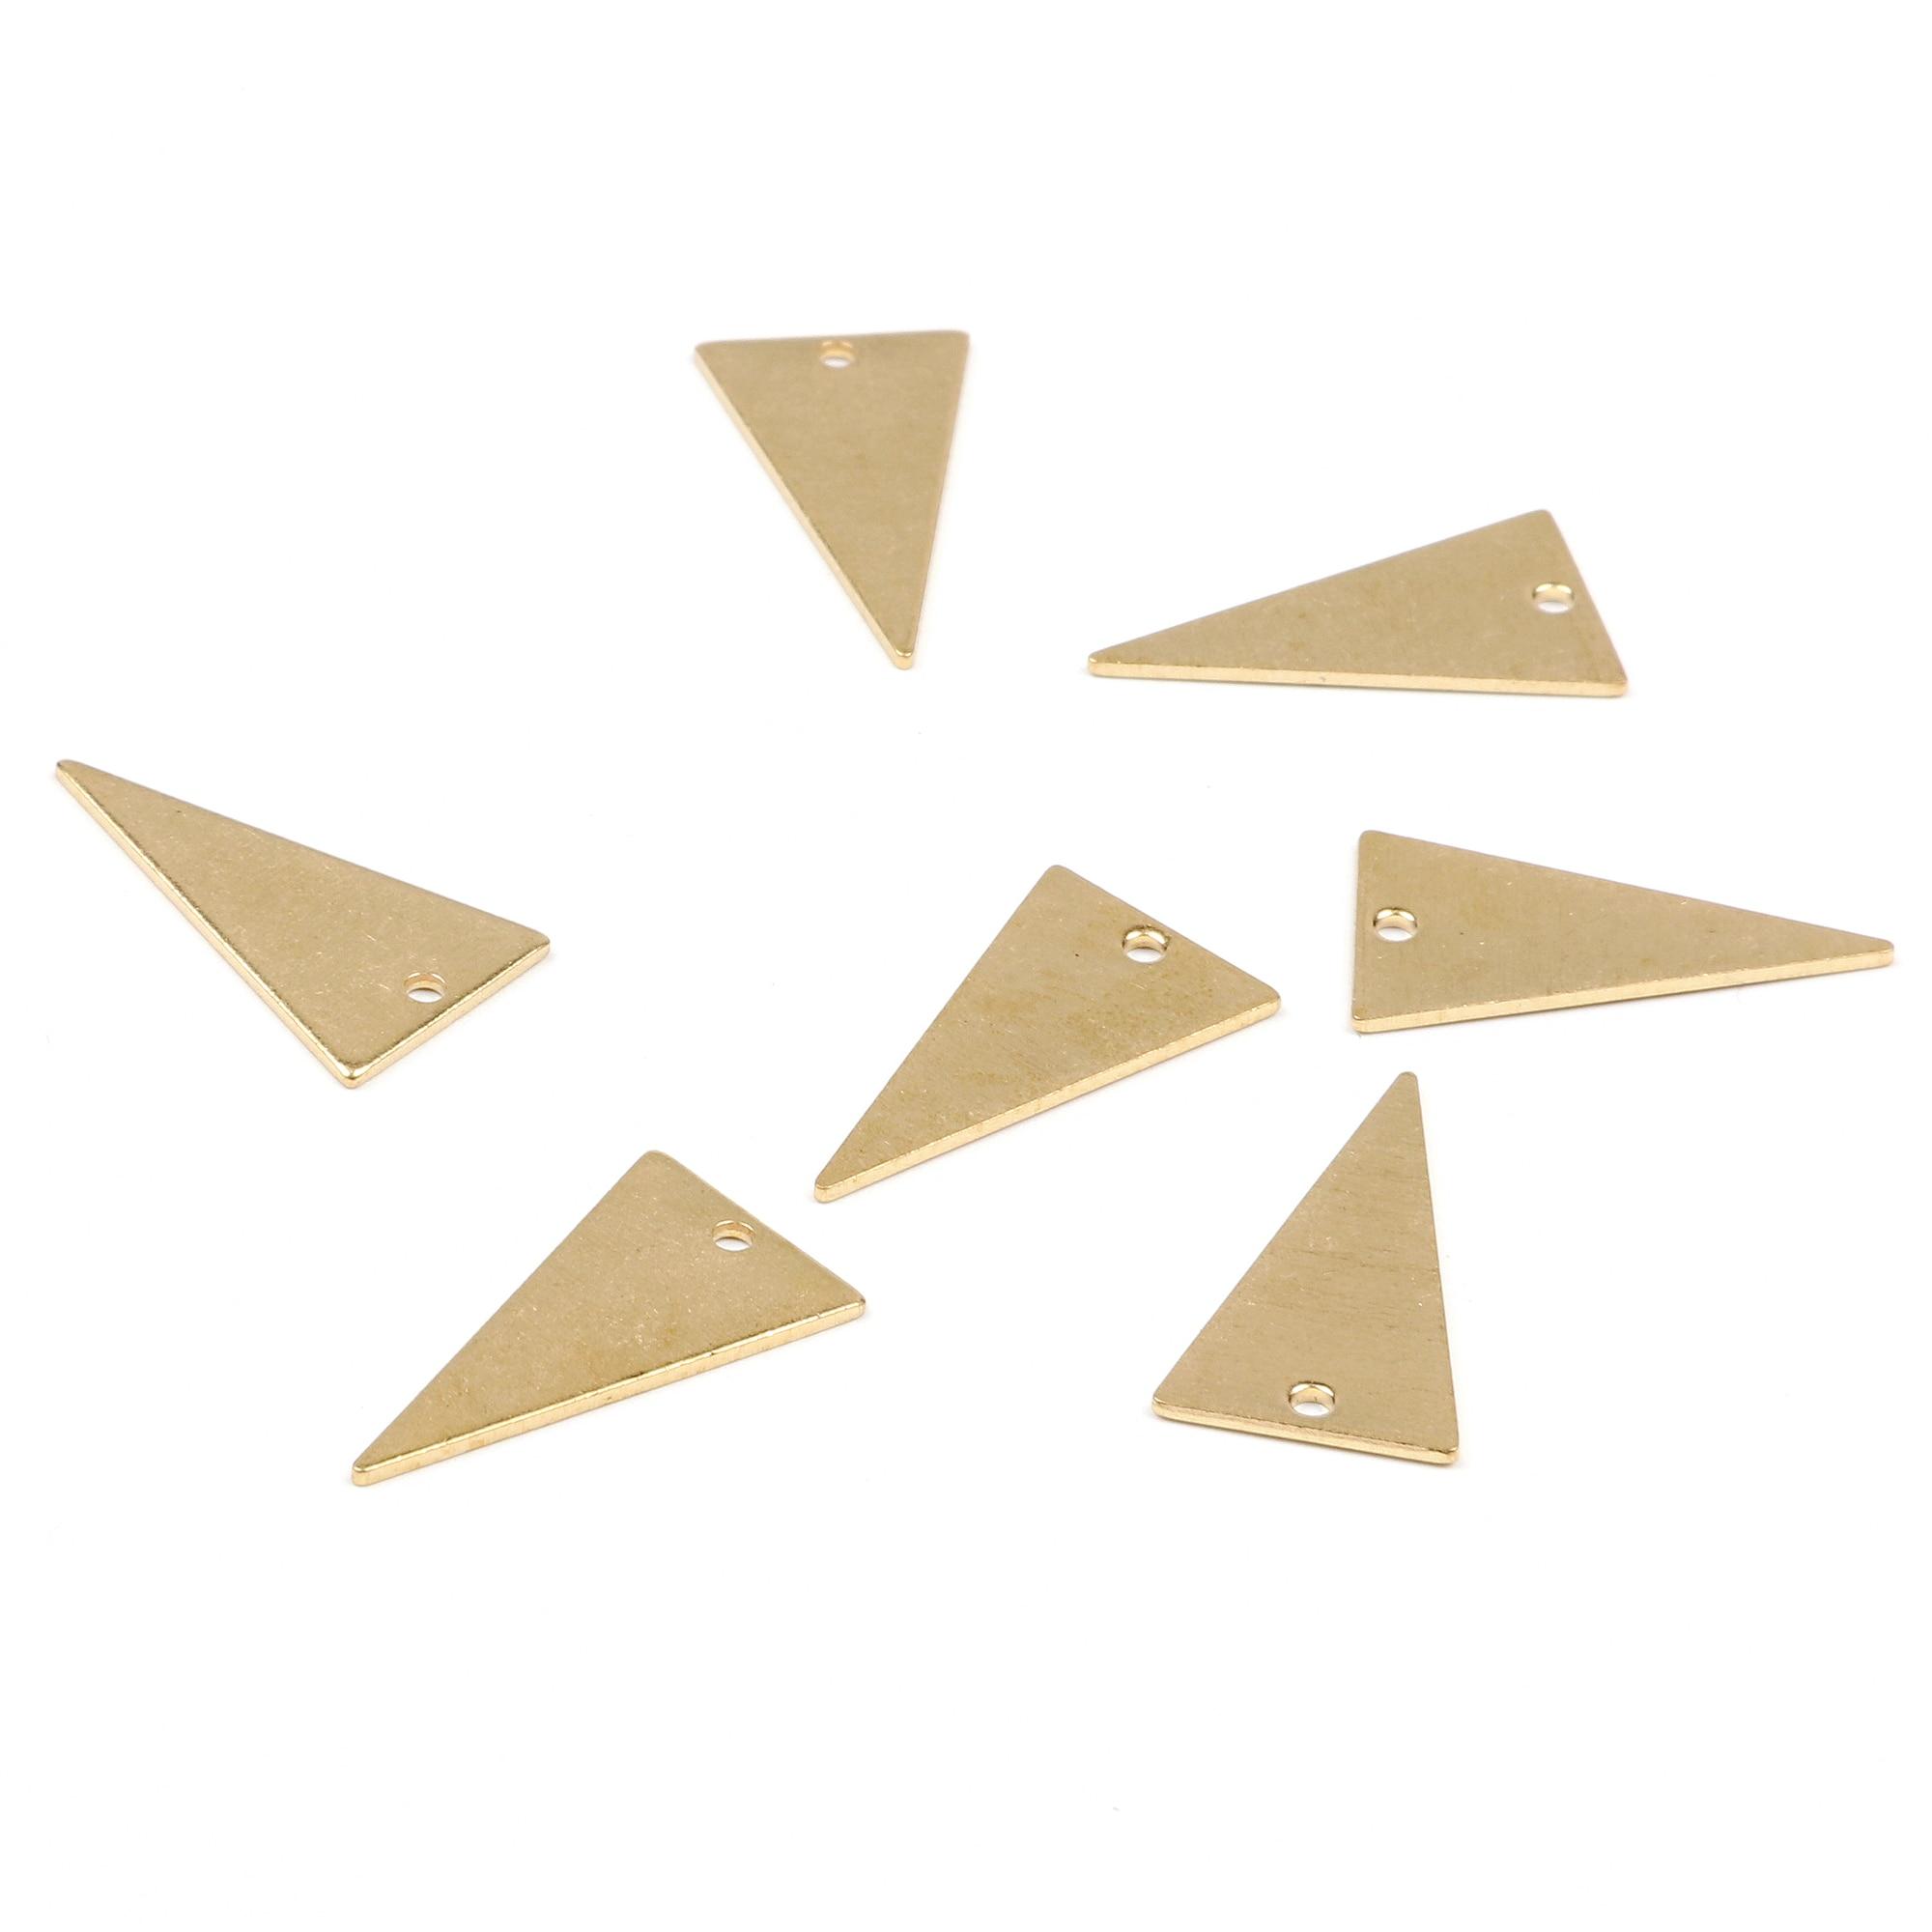 Colgantes geométricos de latón, hallazgos de pendientes de latón crudo, colgante de latón crudo, pendientes triangulares, abalorio de latón, 20,5mm x 11,5mm-RB1109